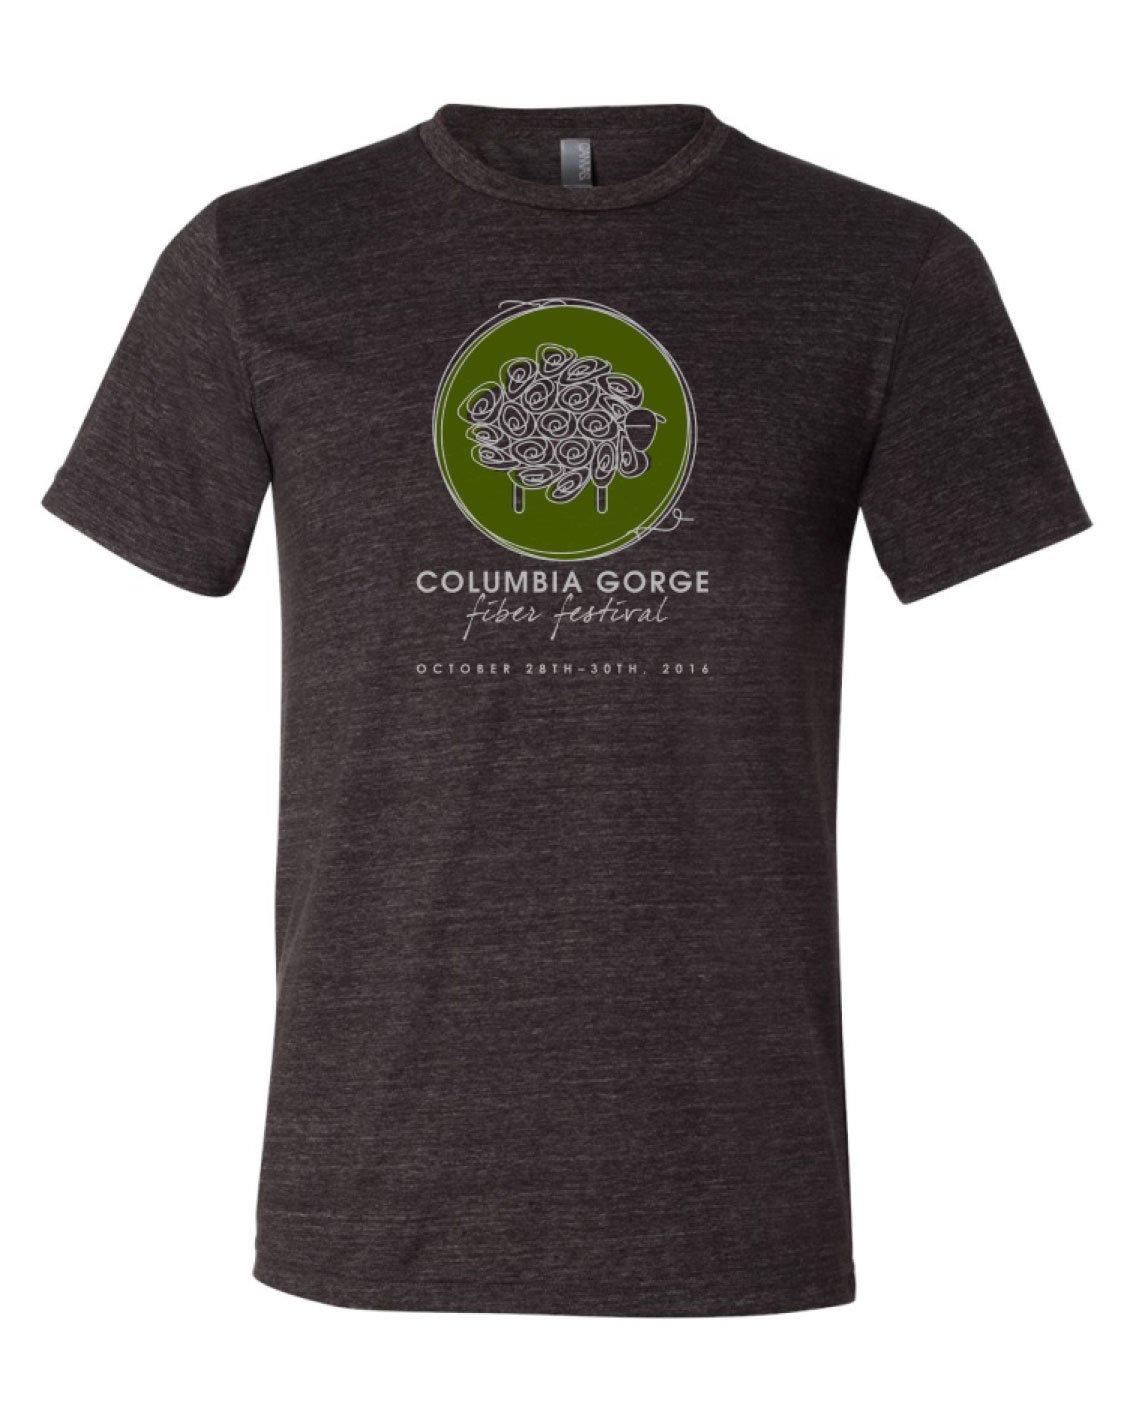 CGFF 2016 T-shirt